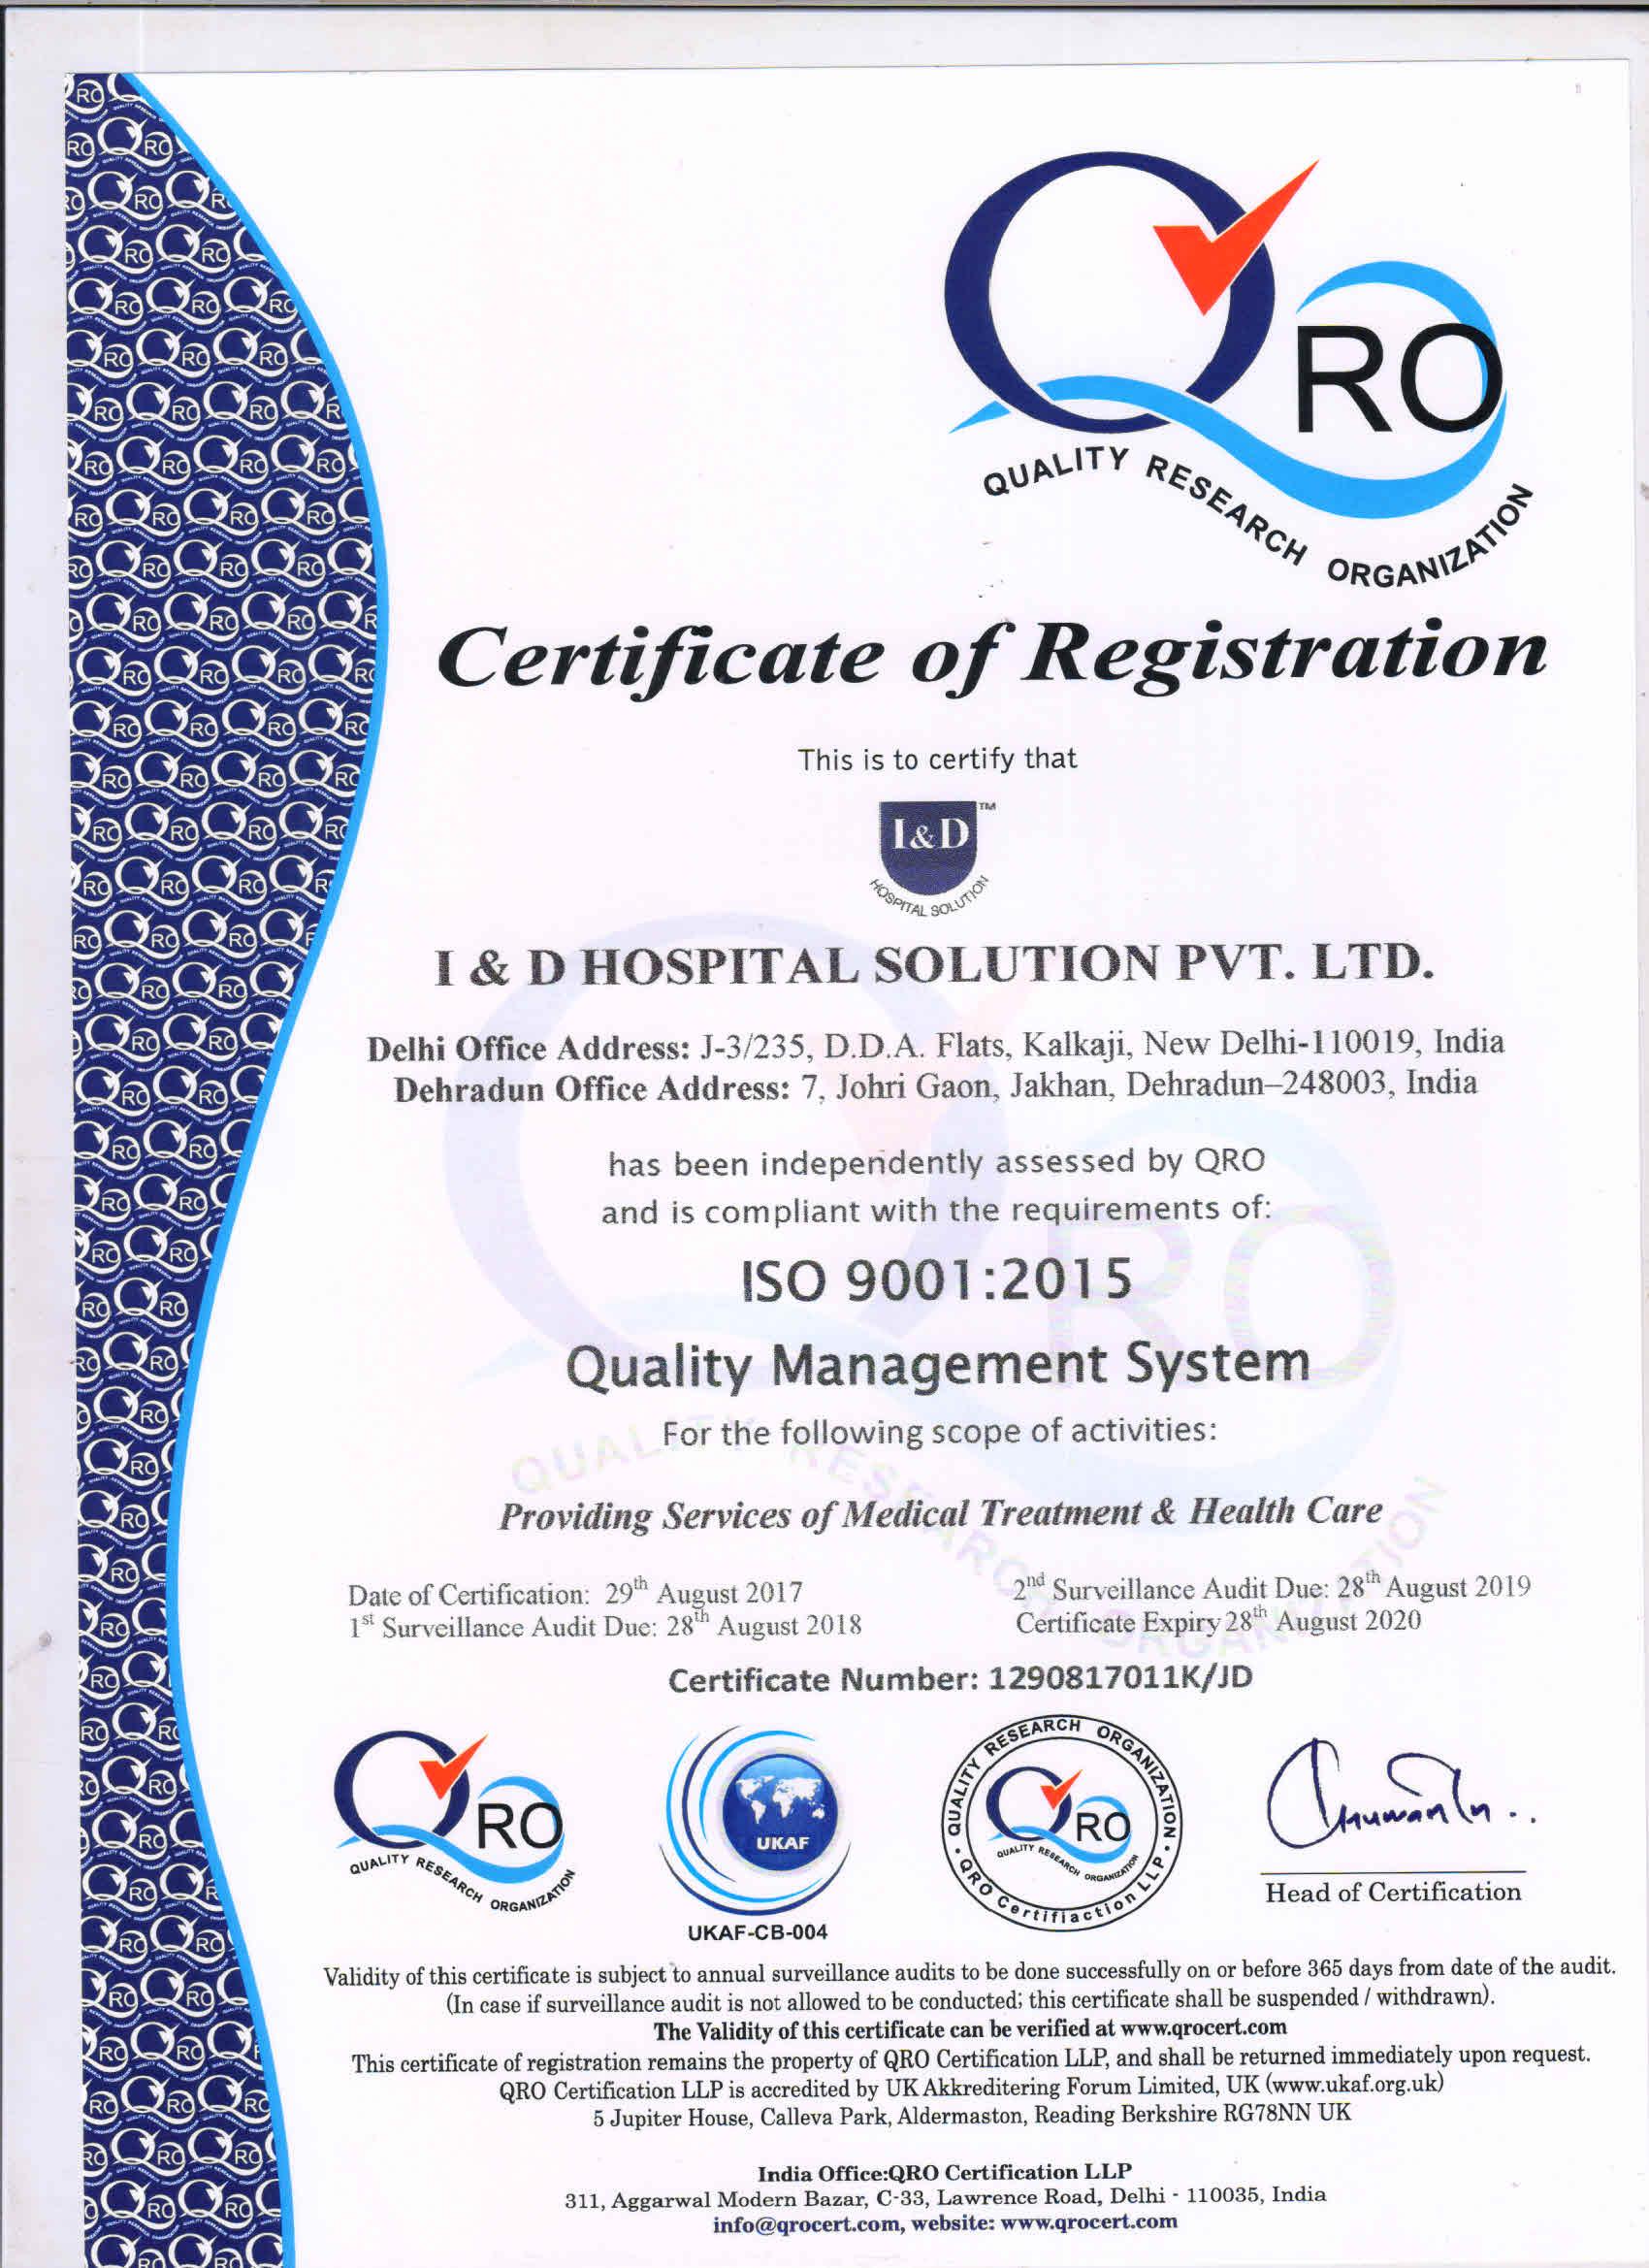 Best Healthcare Management Software in India – I&D Hospital